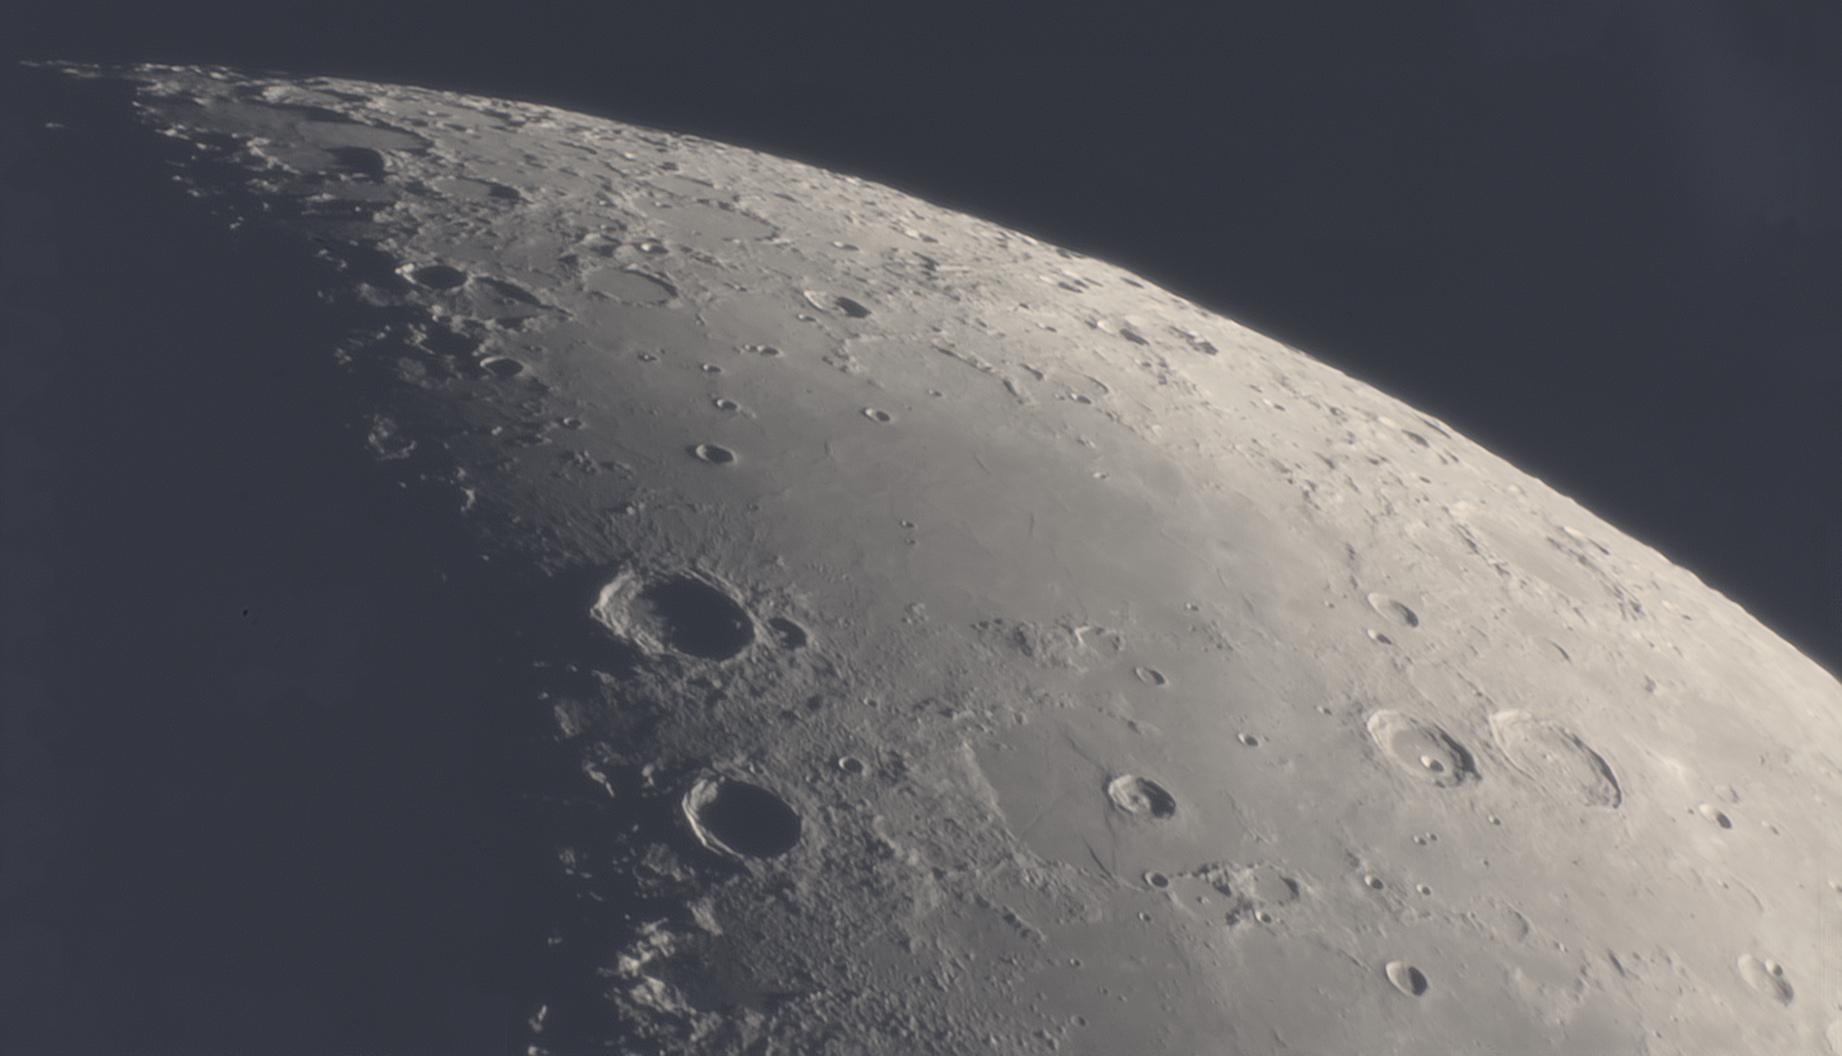 lune1.jpg.3e514929c0f1f11e8dbd48b241c49279.jpg